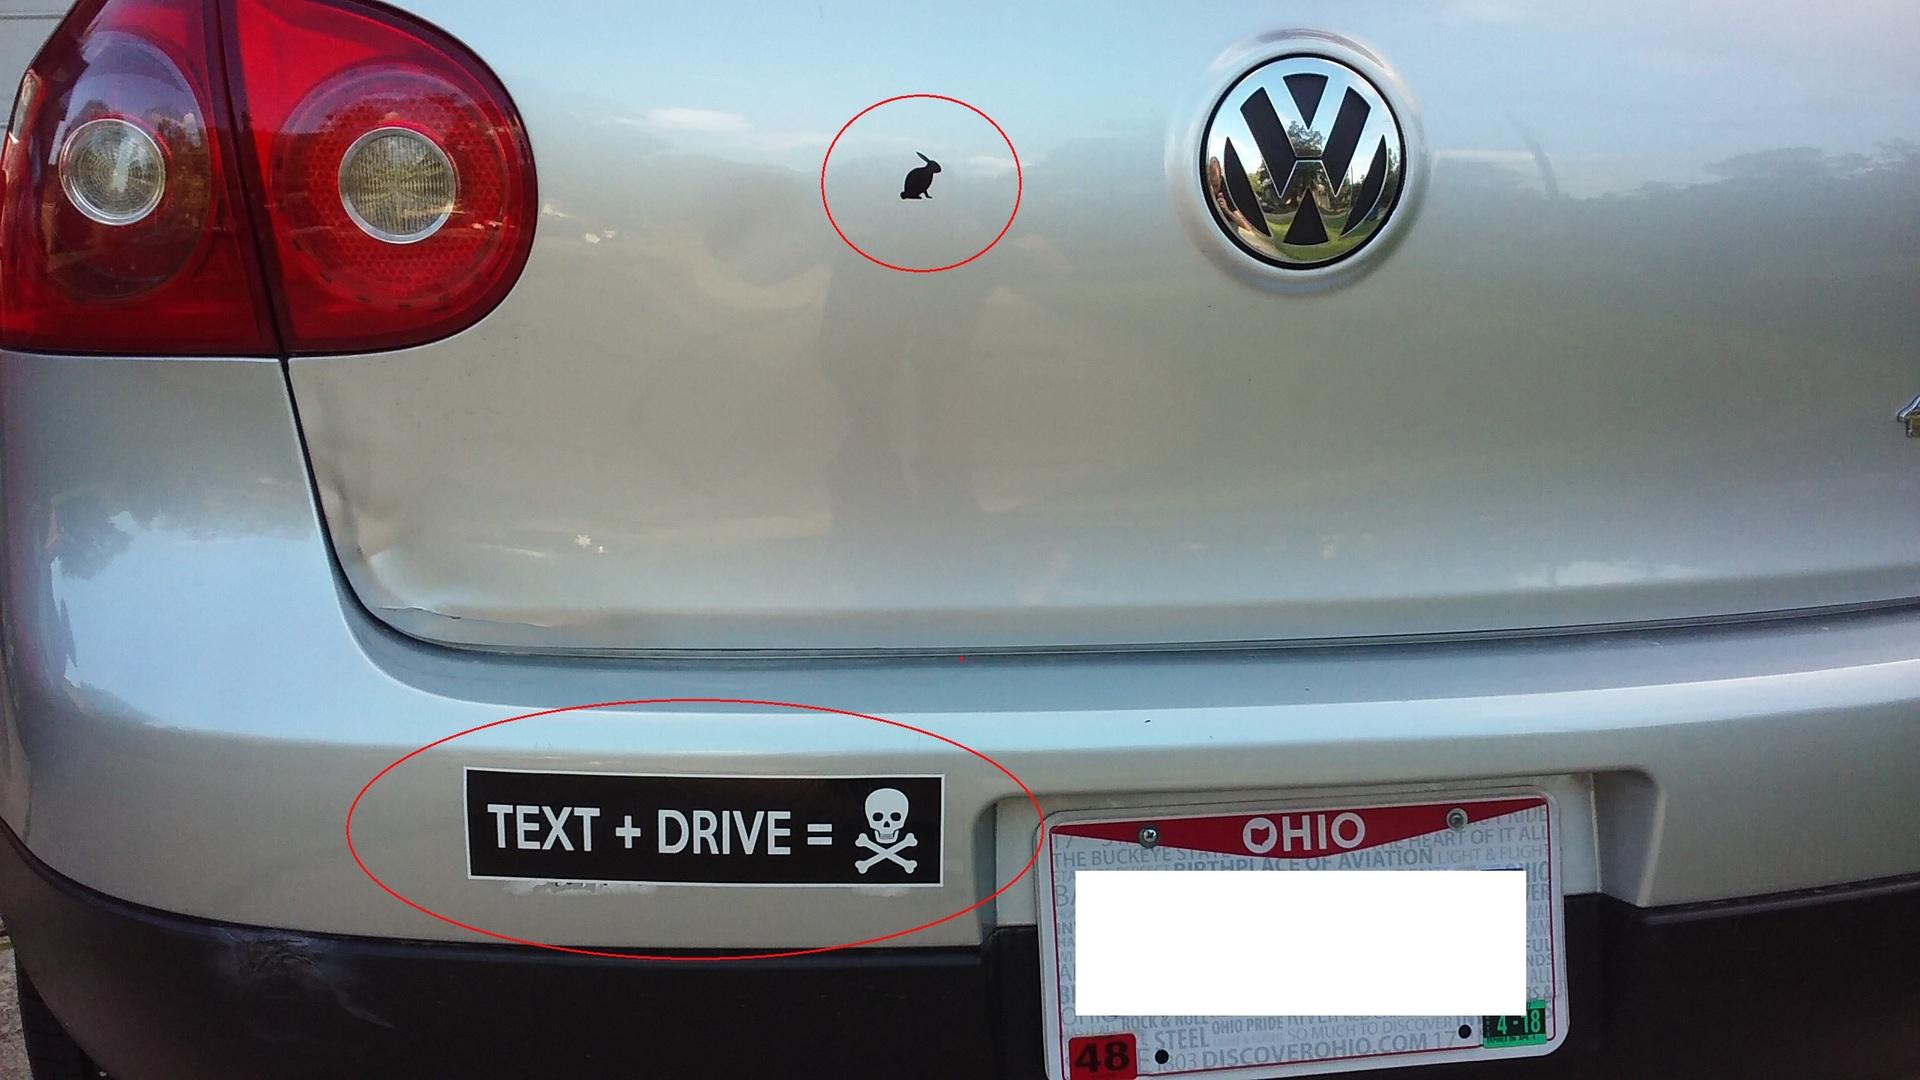 Roman's photograph of their Text + Drive Customizable Bumper Sticker